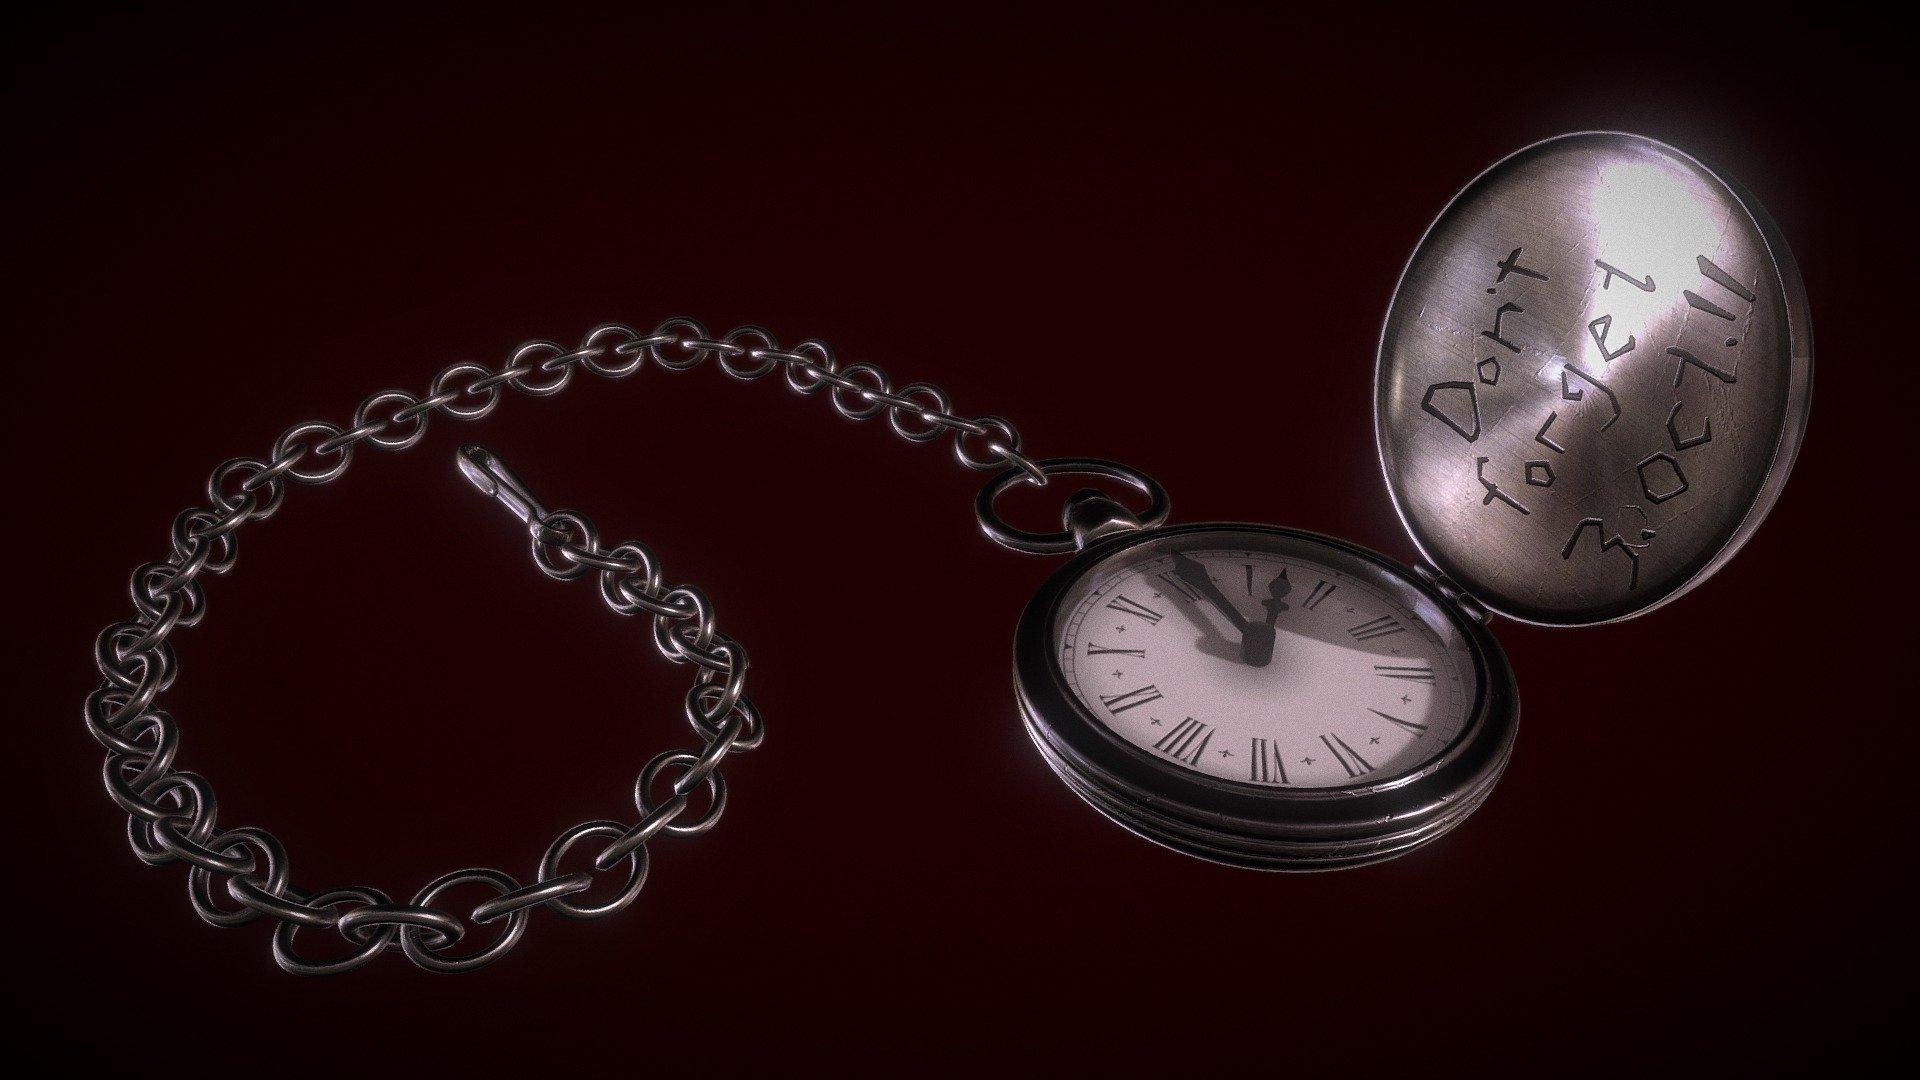 Fullmetal Alchemist Pocket Watch Drawing - Montre de poche ...